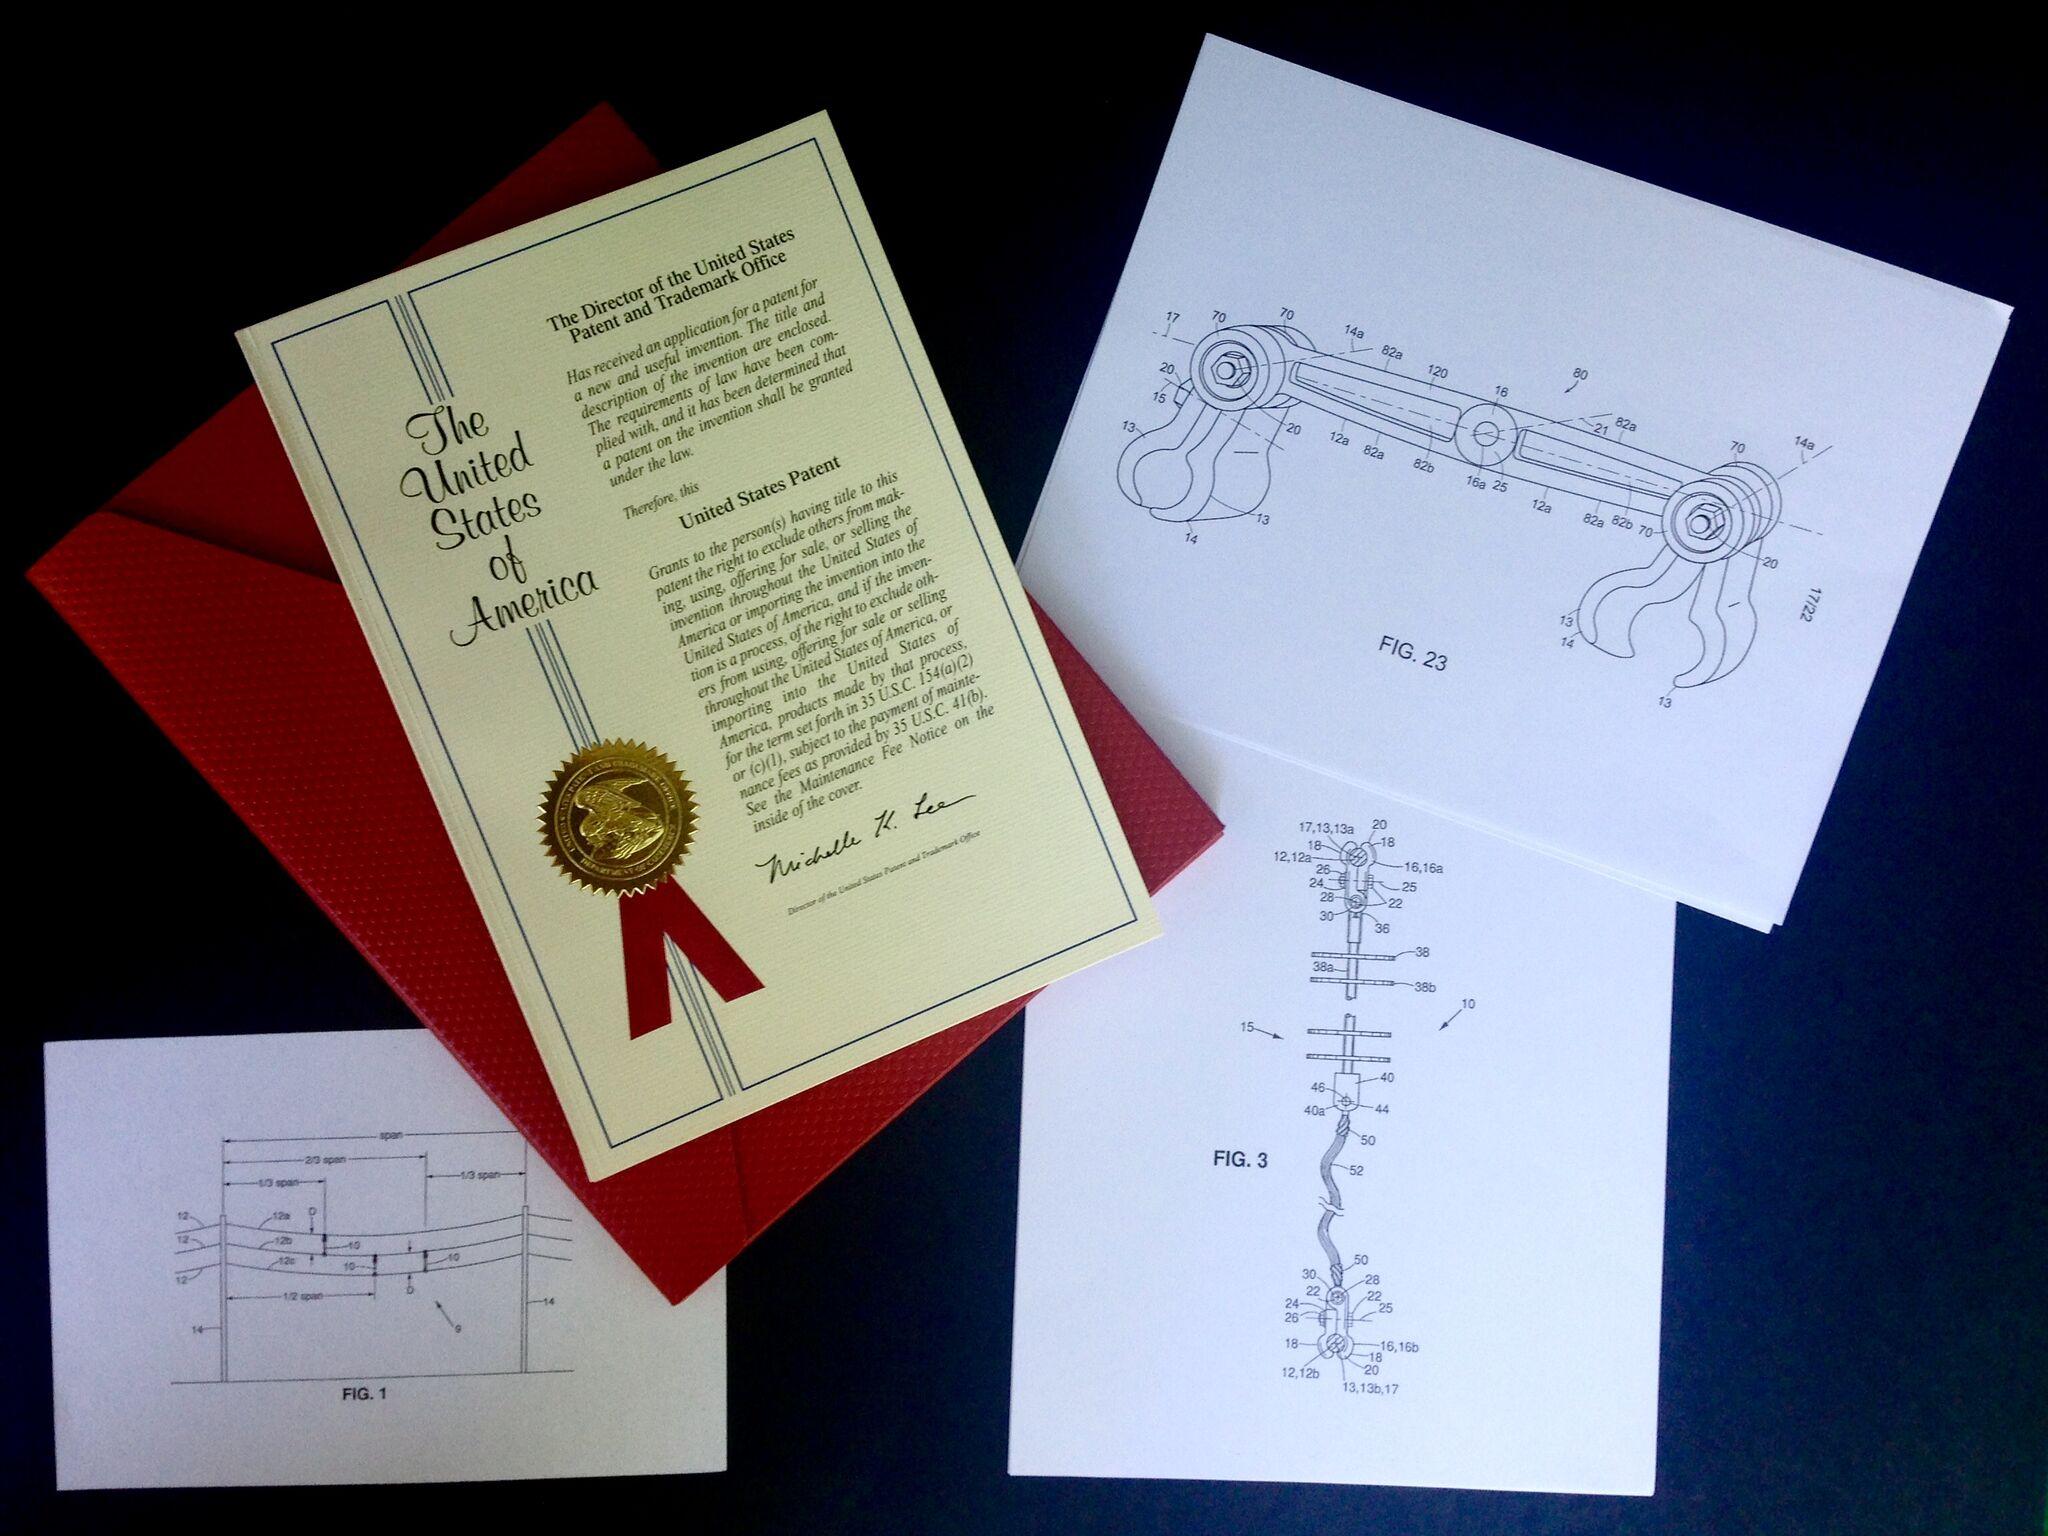 Image-Patent LP